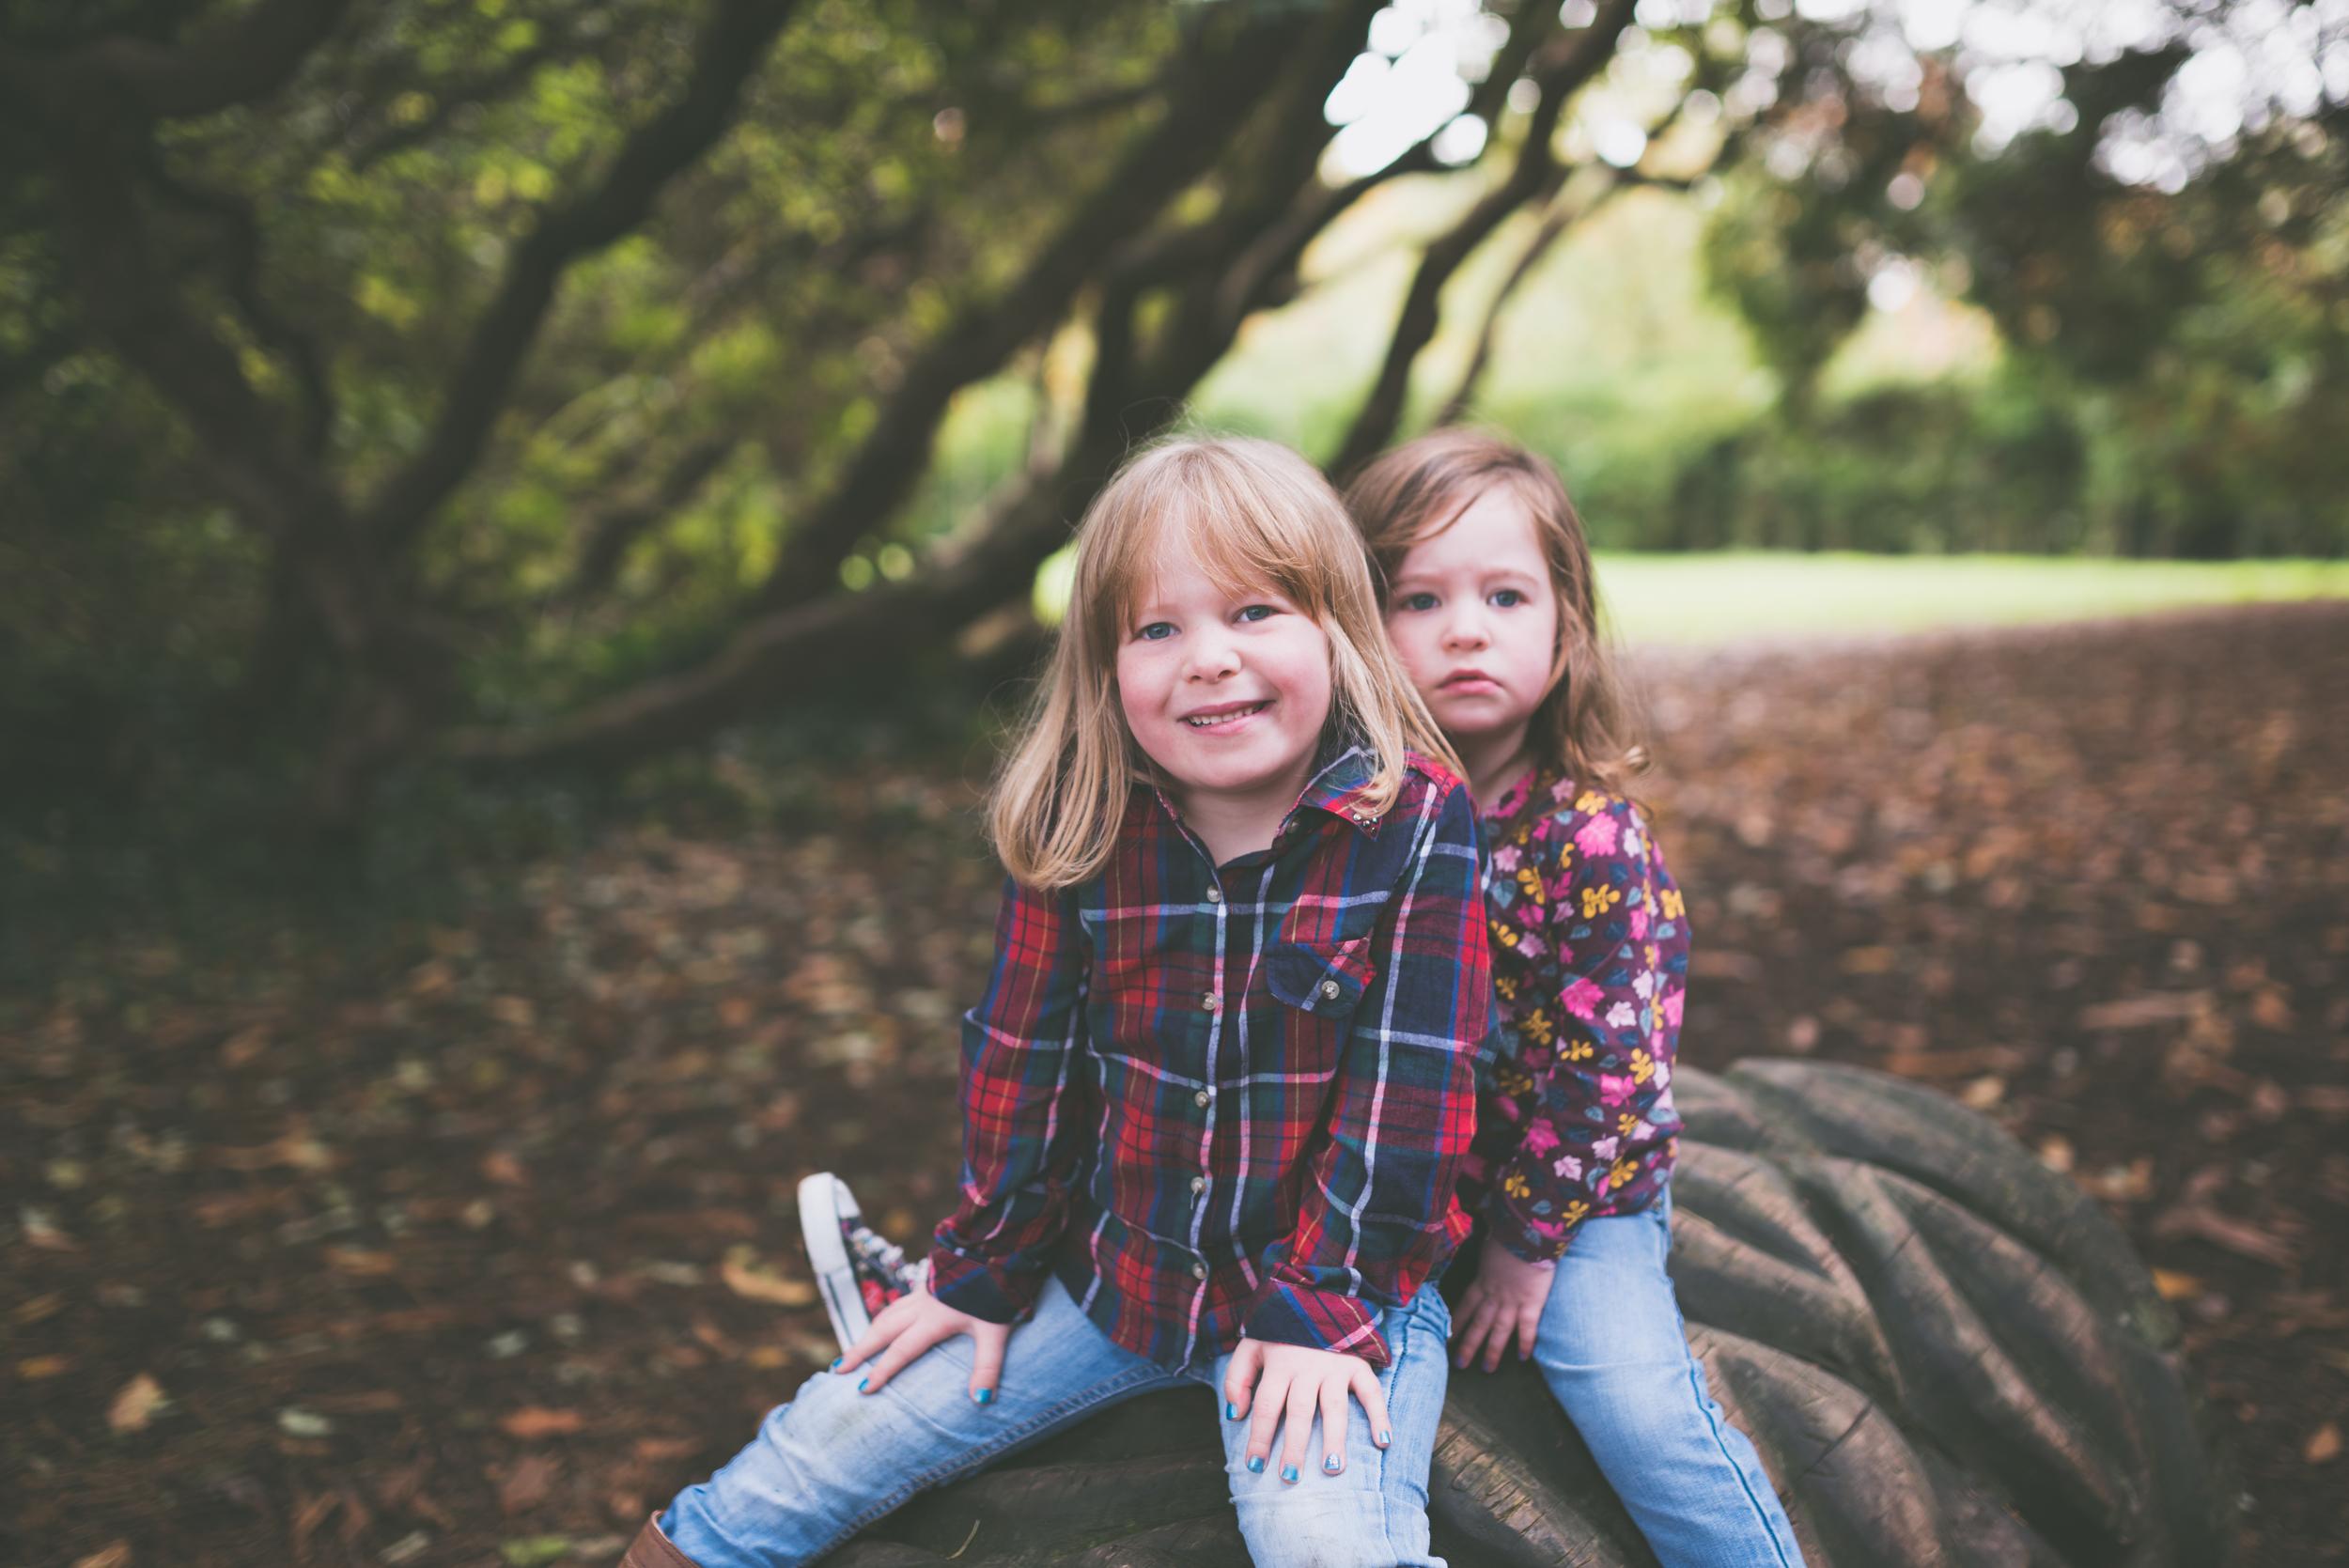 Northern_Ireland_Family_Photographer_Purephotoni_Lady_Dixons_Park_Maddison_and_Eden